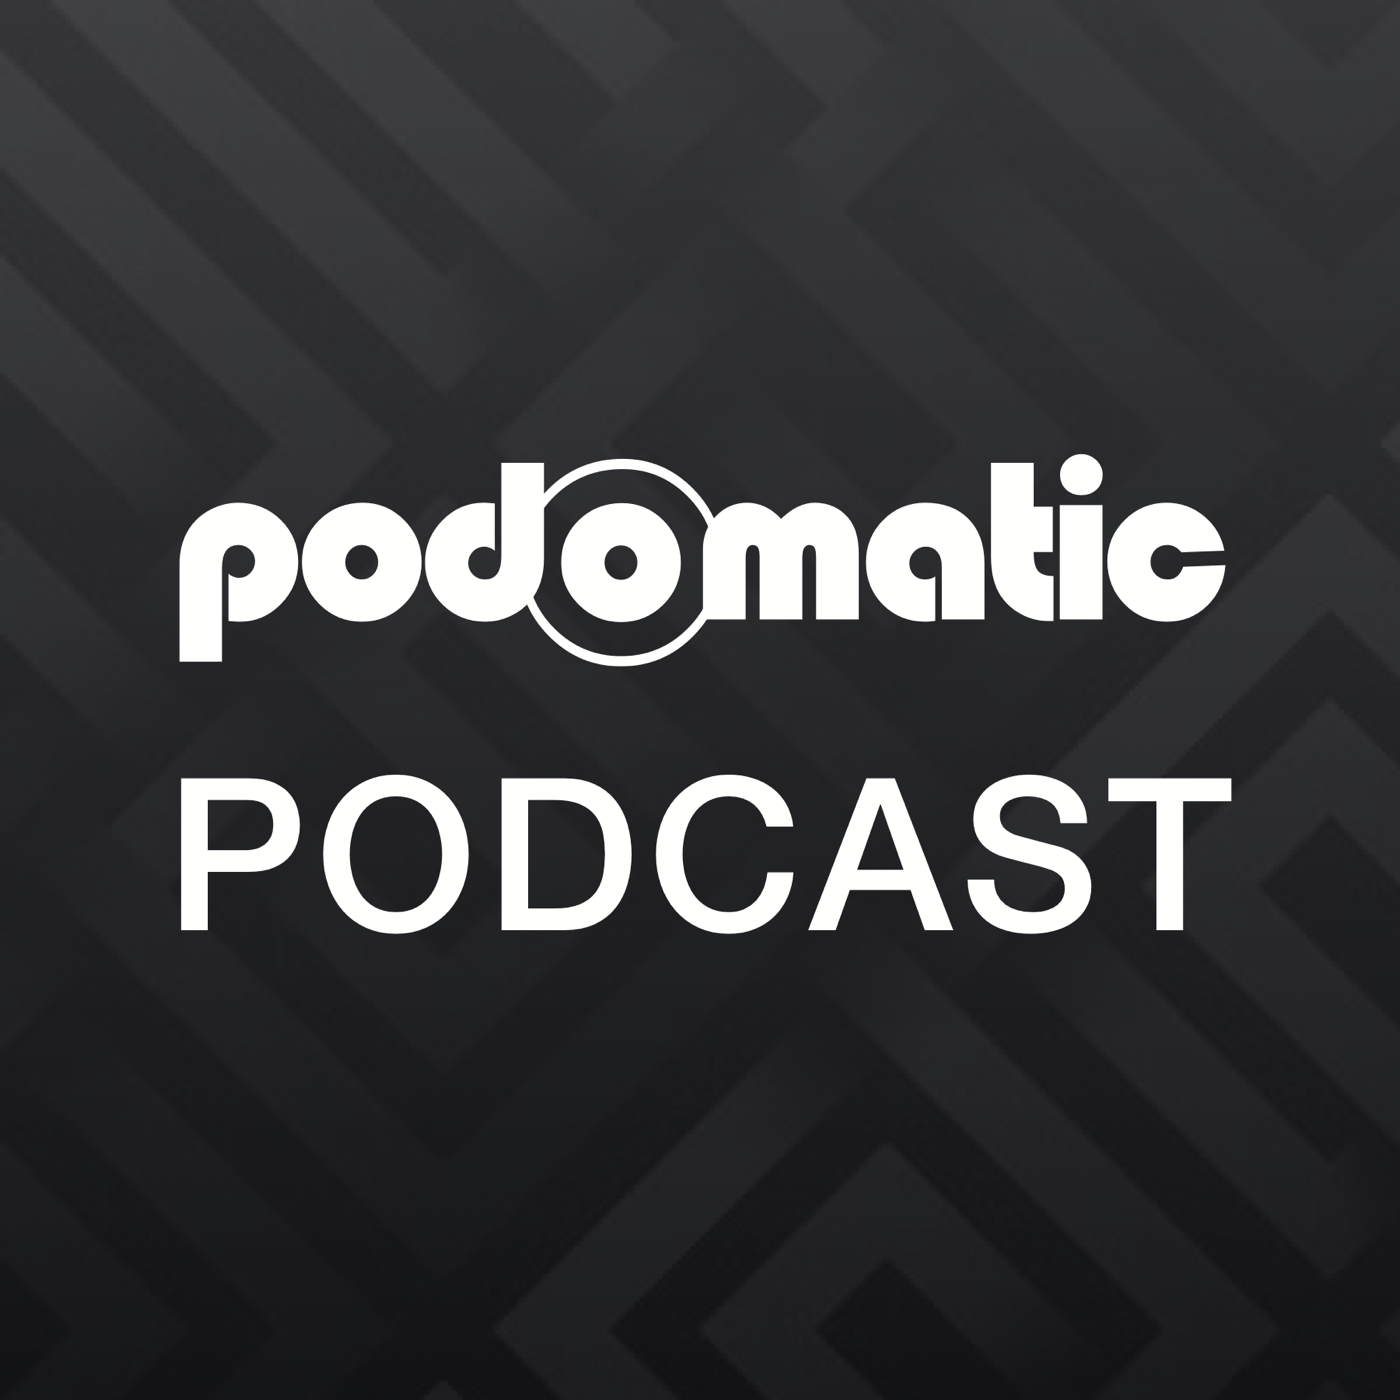 electroaddictive's Podcast